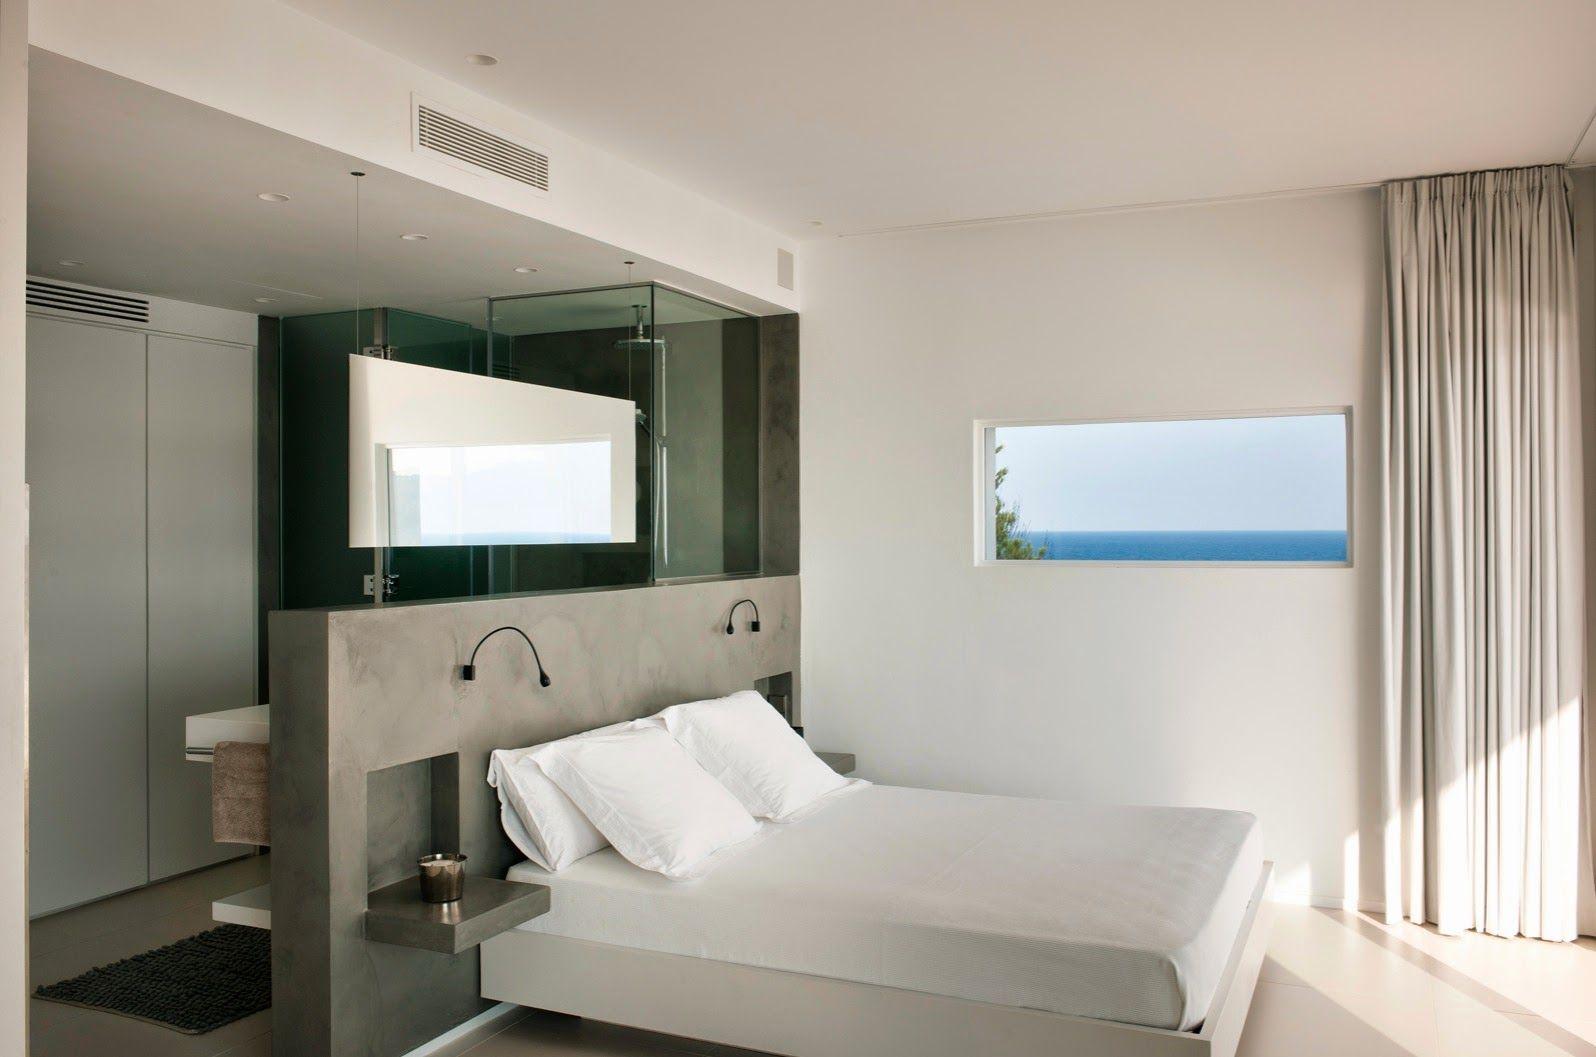 25 Beach Style Open Bathroom Design Ideas Open Plan Bathrooms Open Bathroom Bedroom Layouts